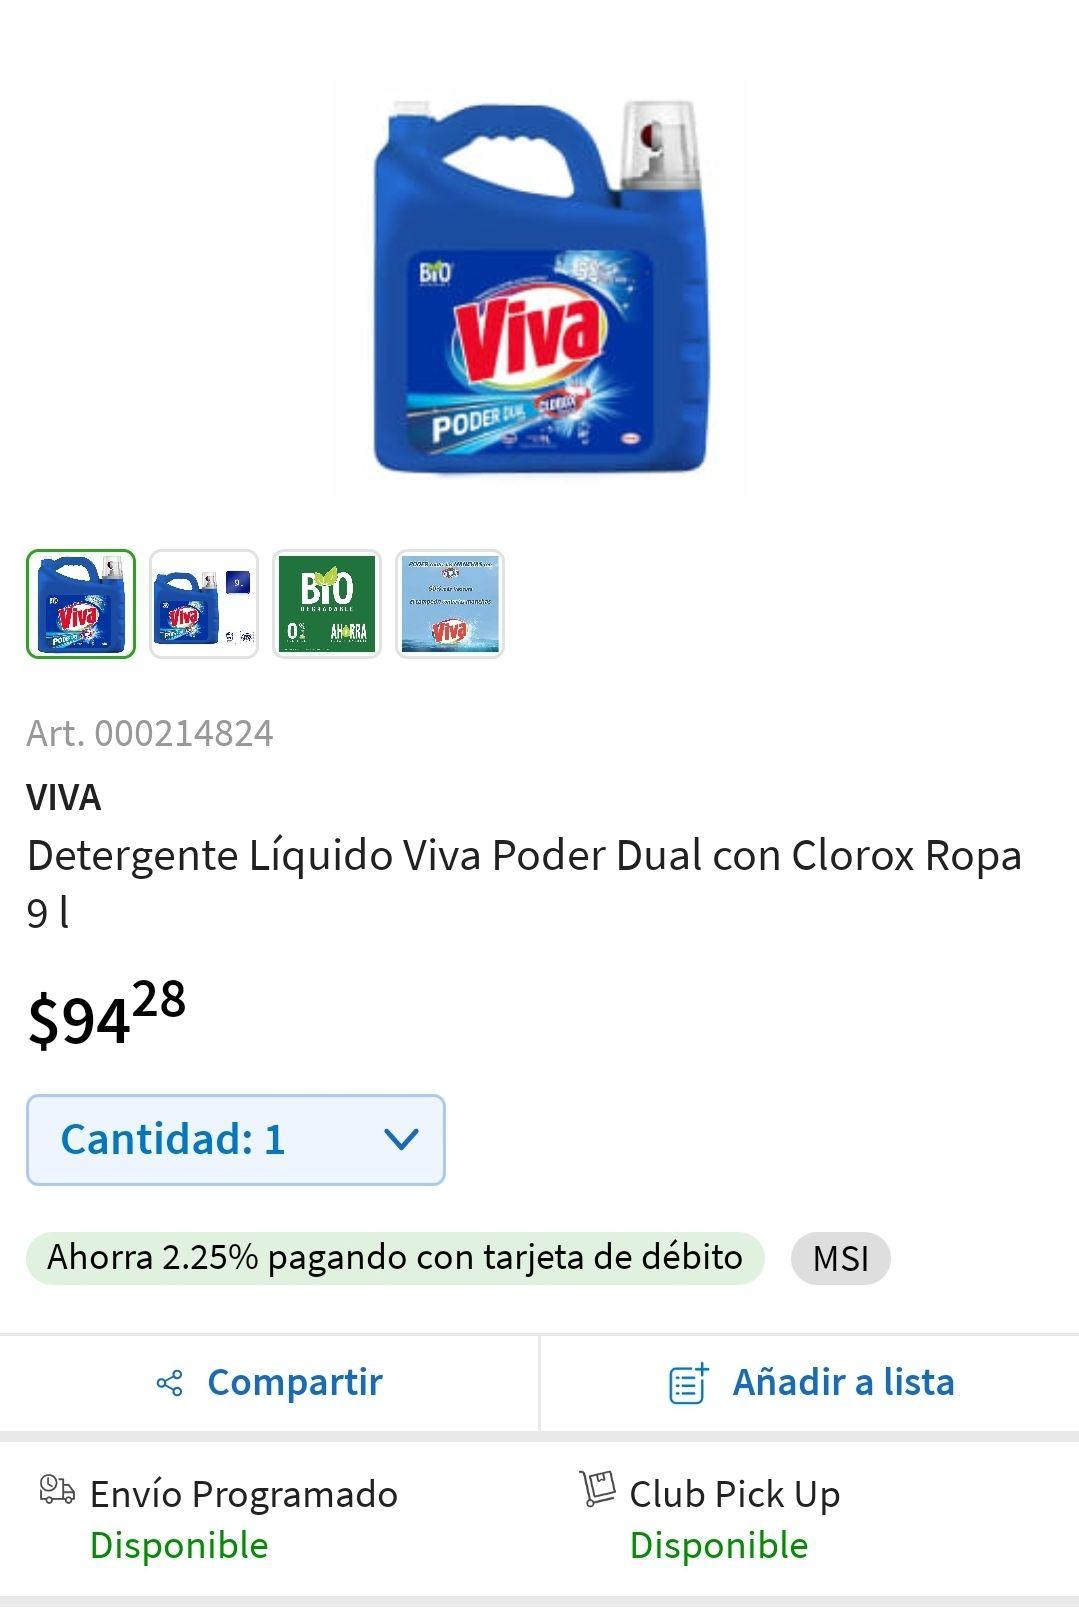 Sam's Club Detergente Líquido Viva Poder Dual con Clorox Ropa 9 l